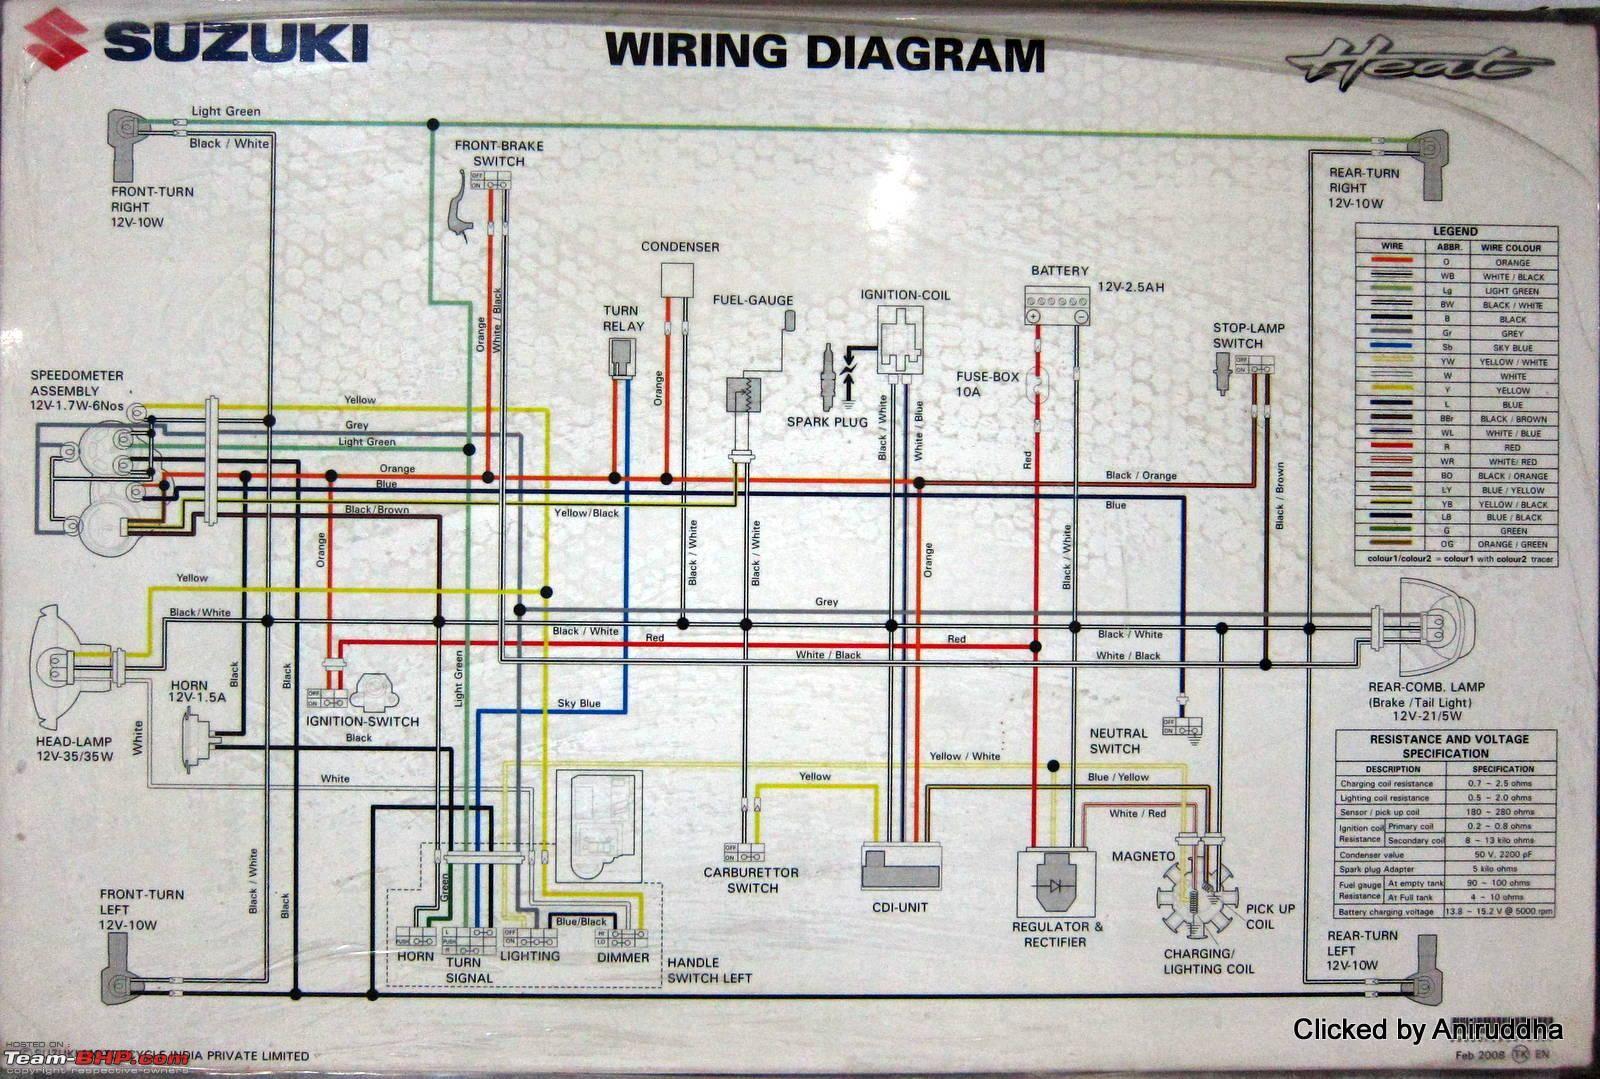 EG_2967] Victory Wiring Diagrams Schematic WiringItive Kargi Boapu Mohammedshrine Librar Wiring 101